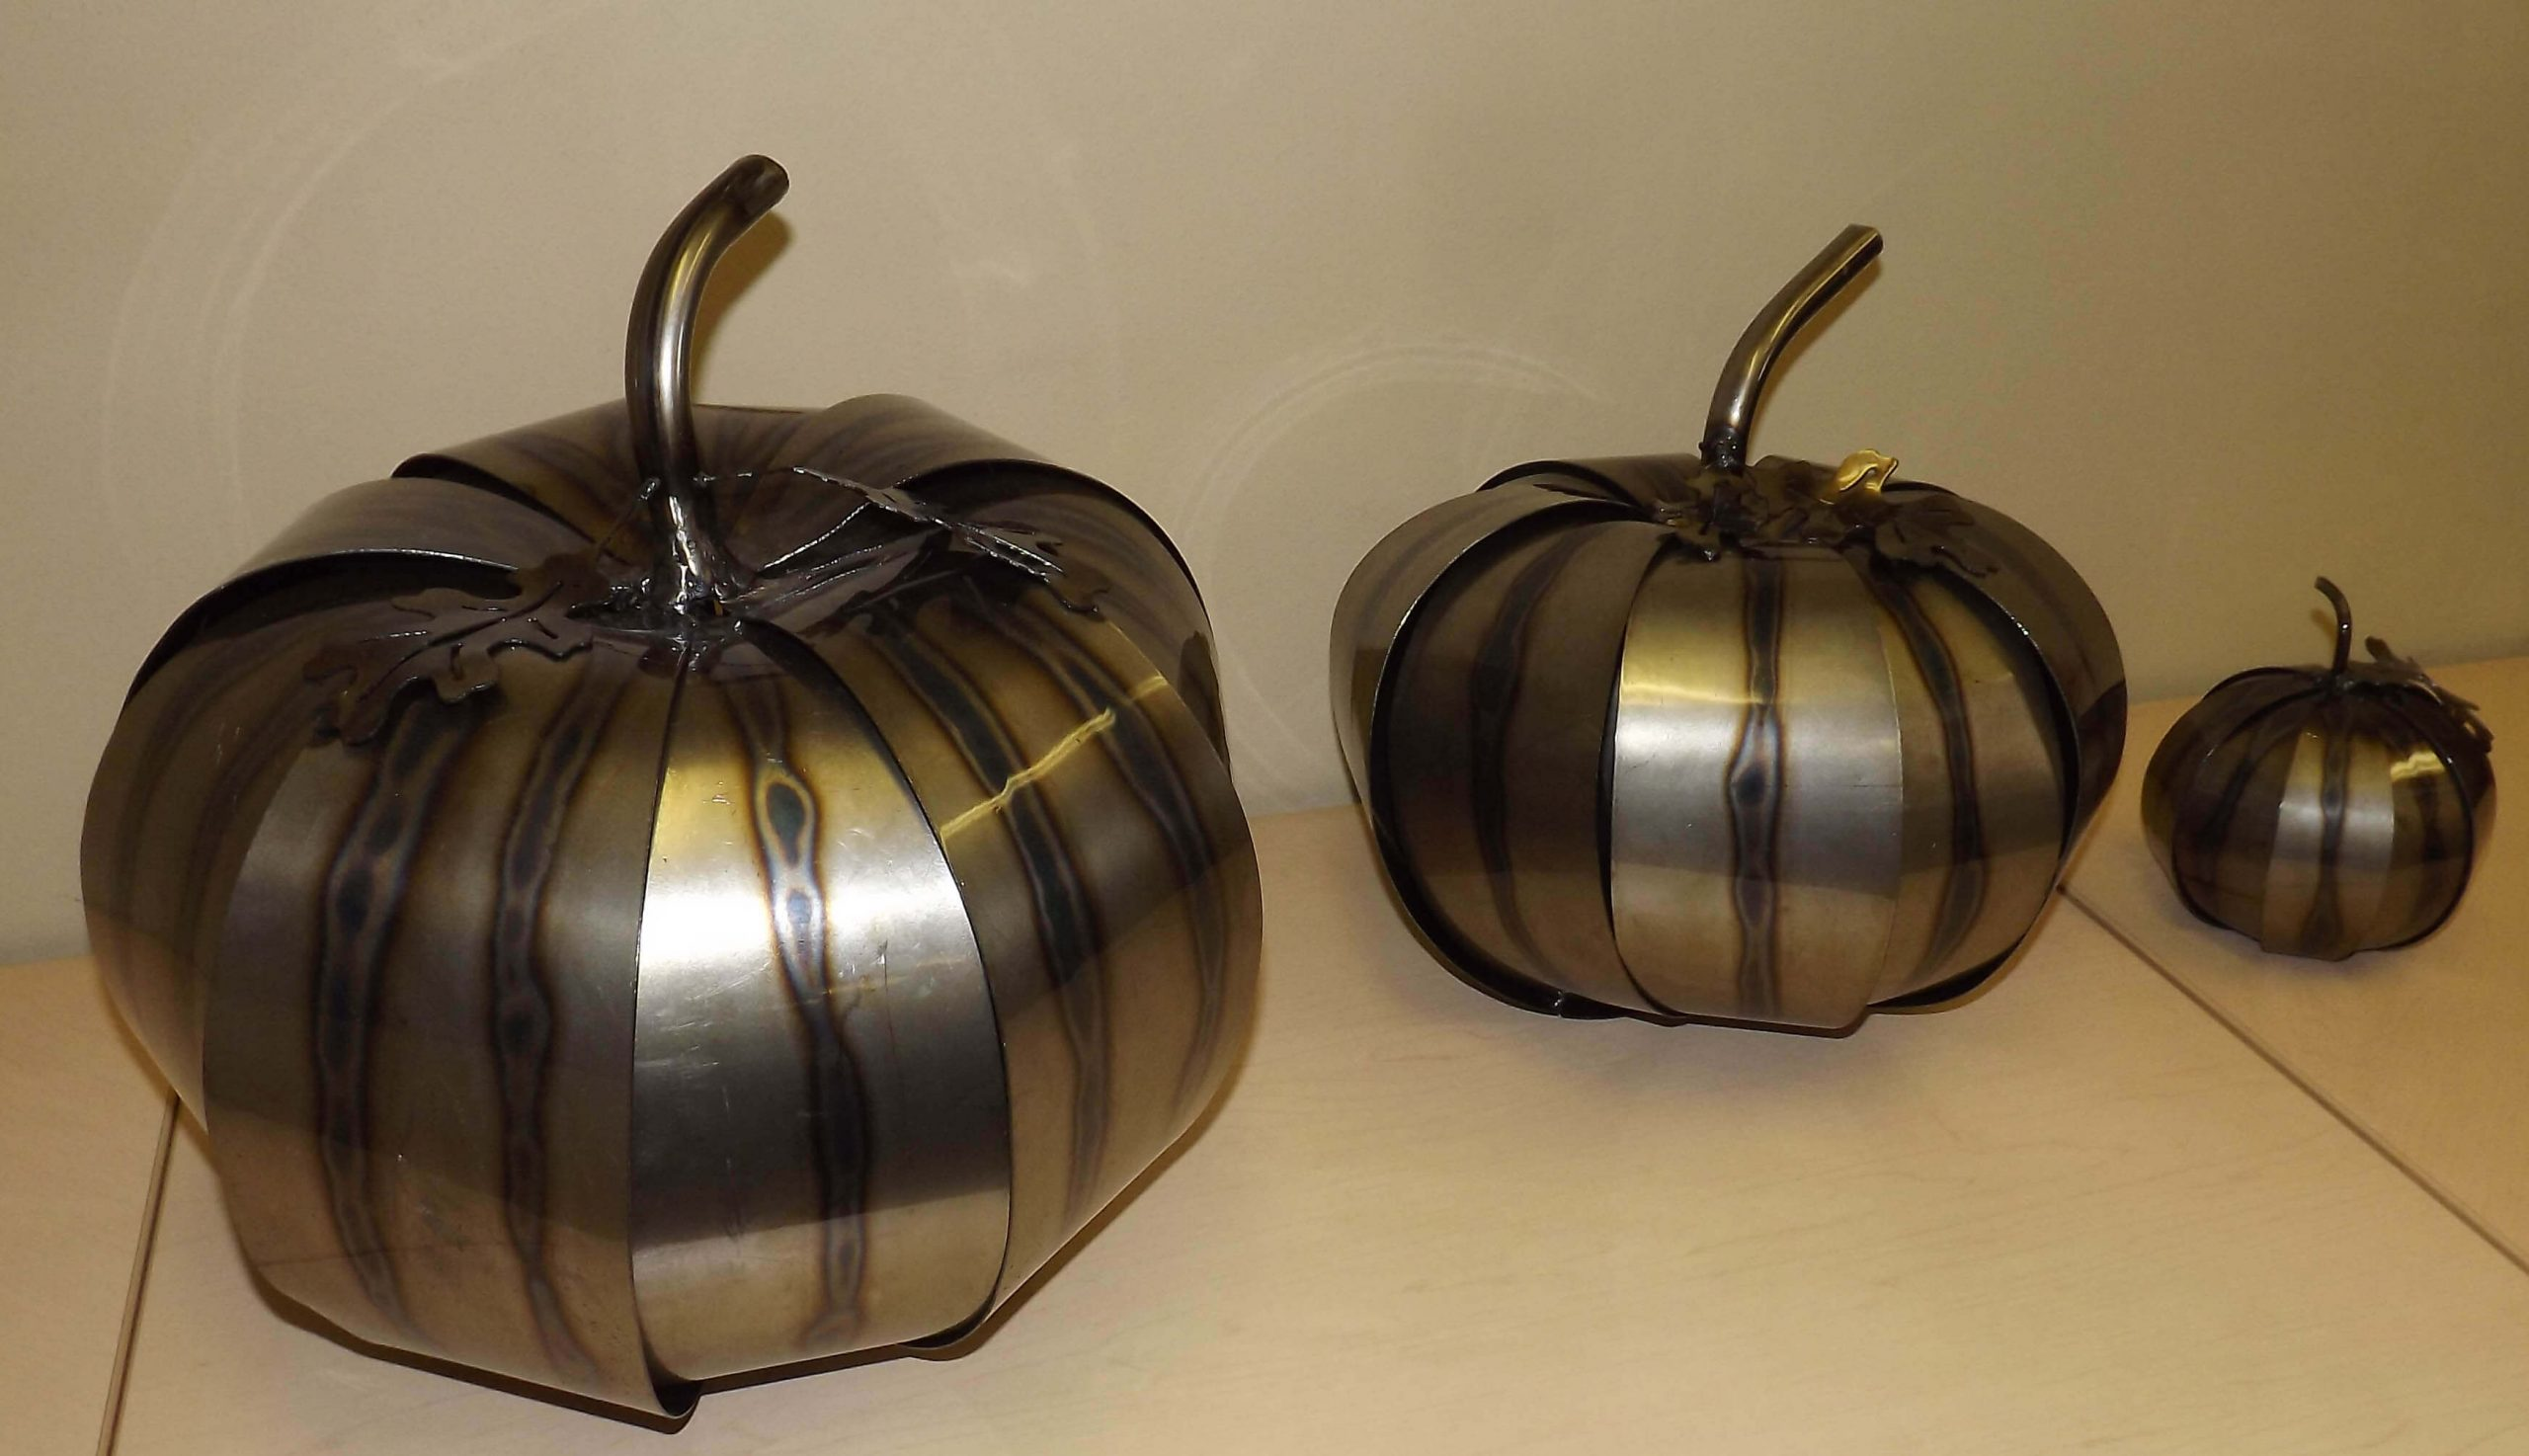 Metal Art - 3D Pumpkins